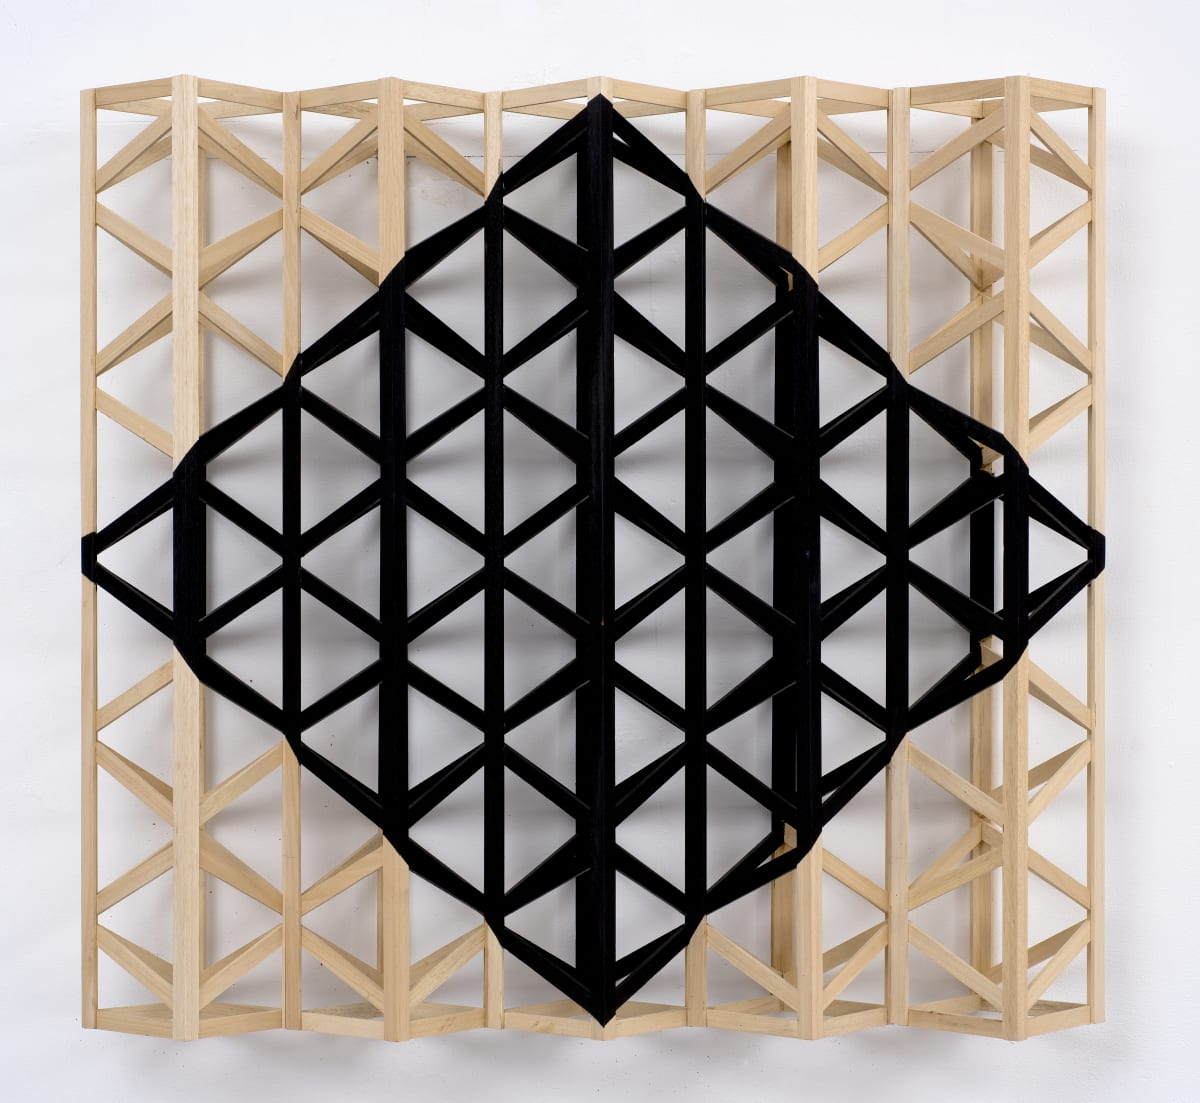 Rasheed Araeen One Black Diamond, 2019 Acrylic on wood Each 80 x 87 x 18 cm 31 1/2 x 34 1/4 x 7 1/8 in